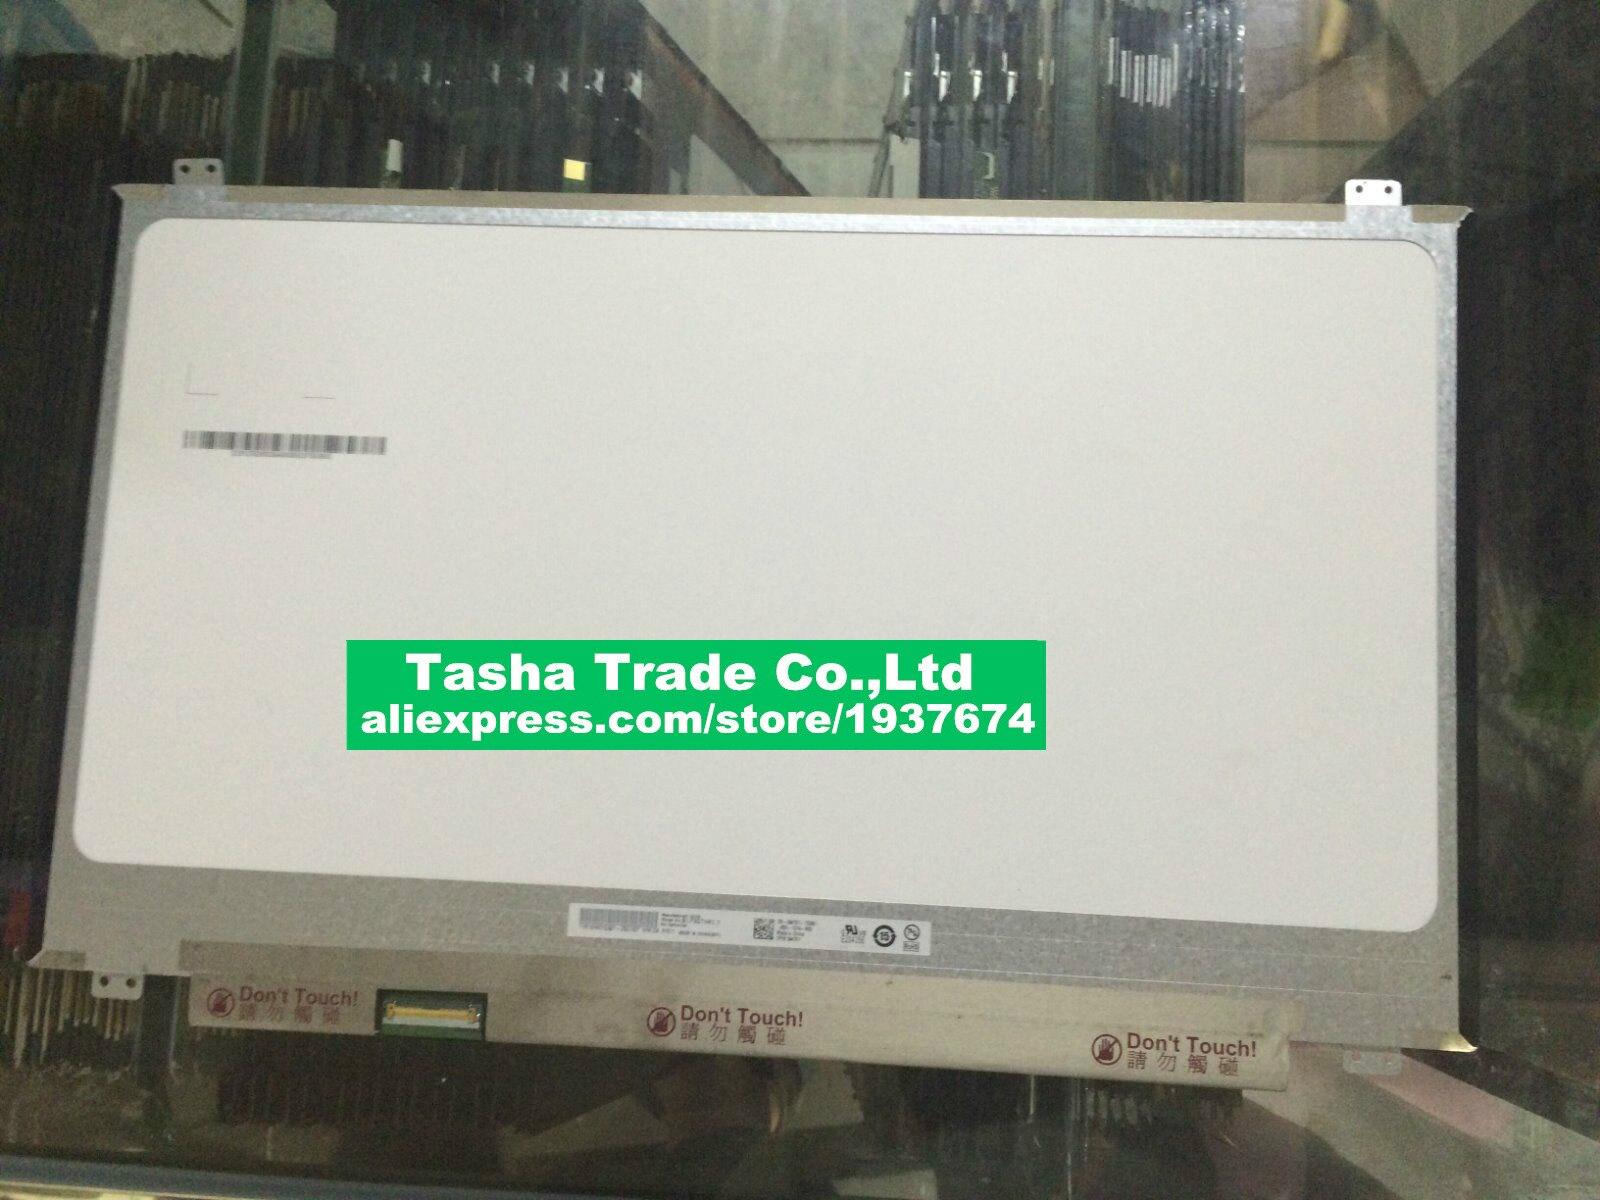 173 2560 B173QTN010 11 B173QTN012 14 173 inch QHD LCD screen 120HZ B173QTN014 B173QTN013